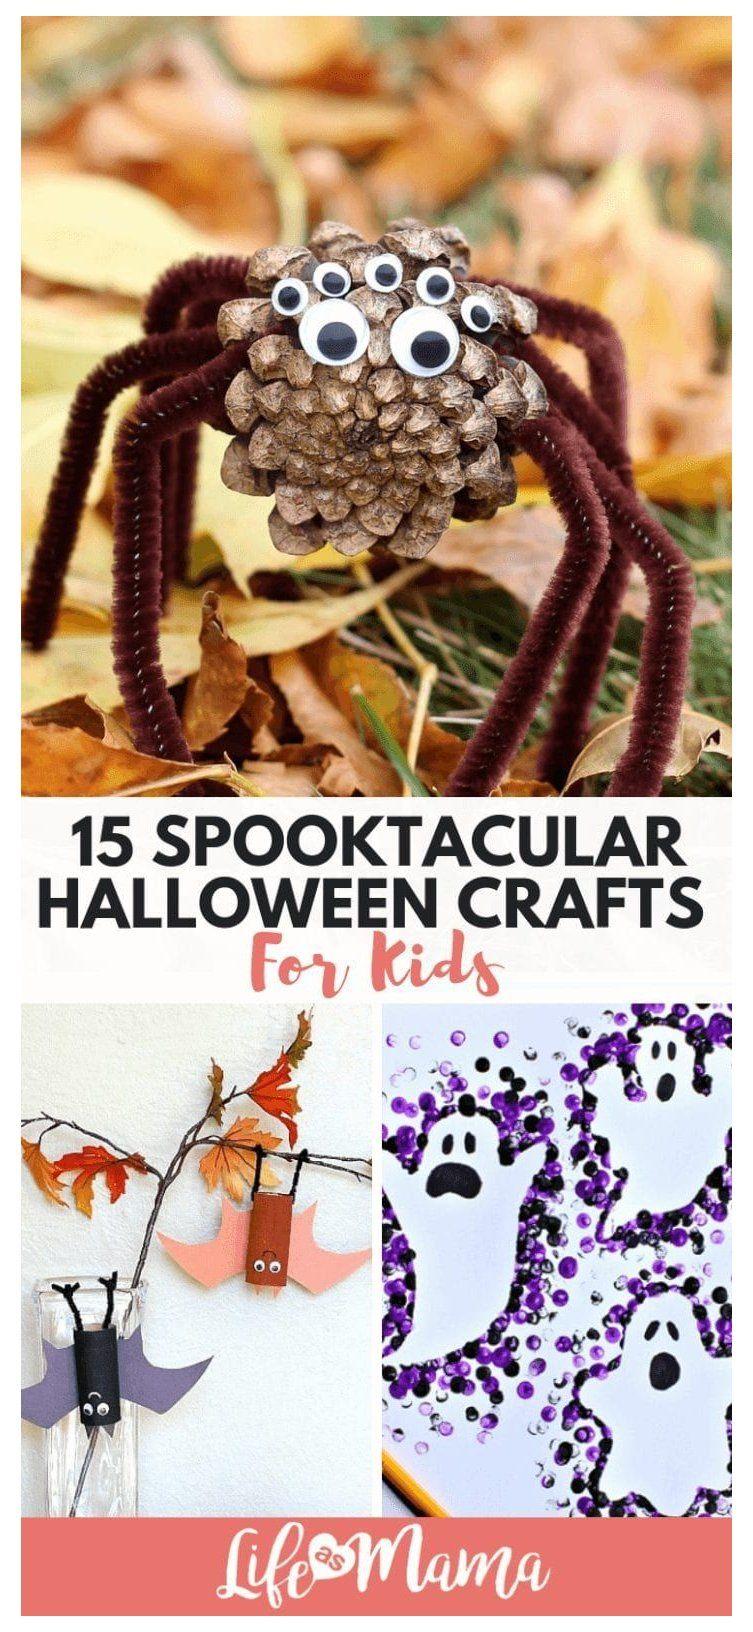 15 Spooktacular Halloween Crafts For Kids #halloweencrafts